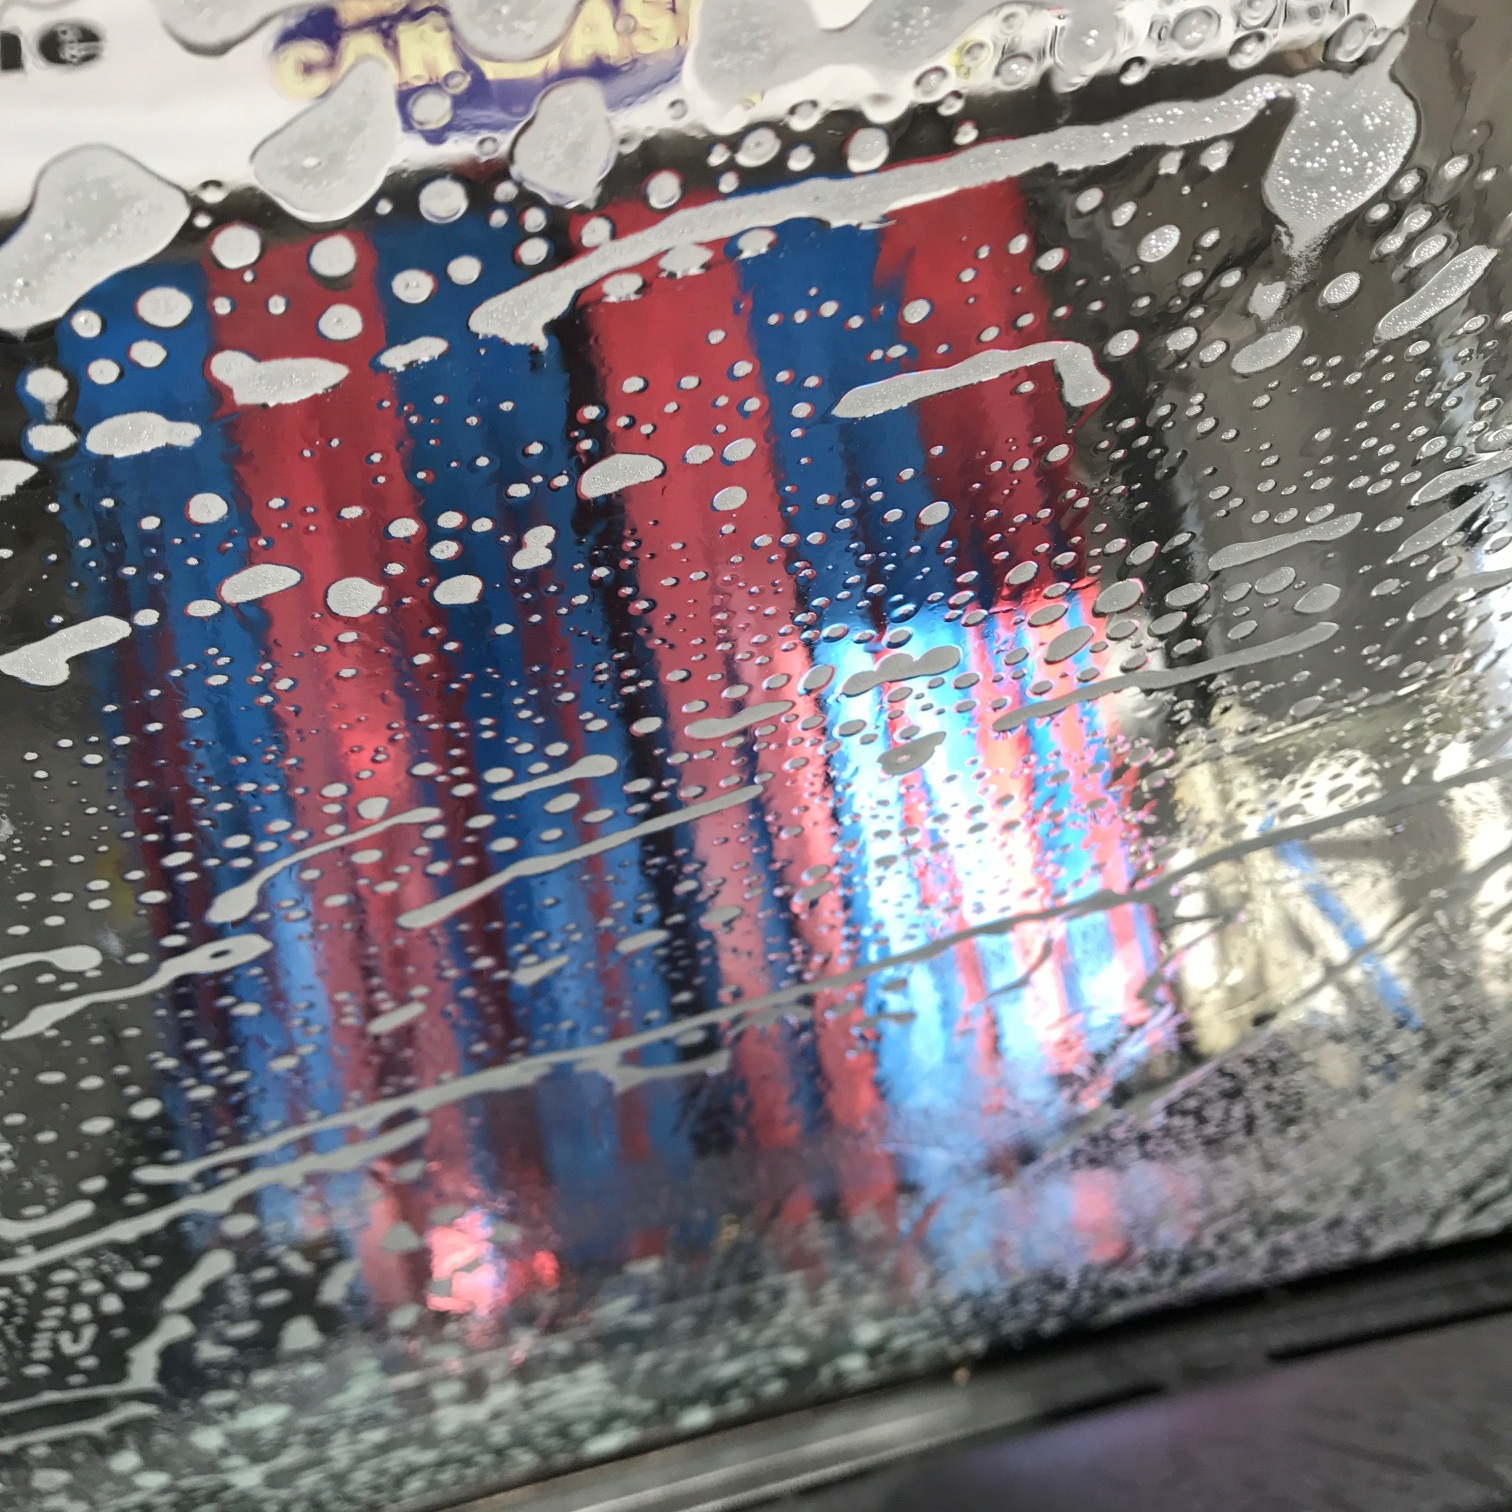 Carwash Services -